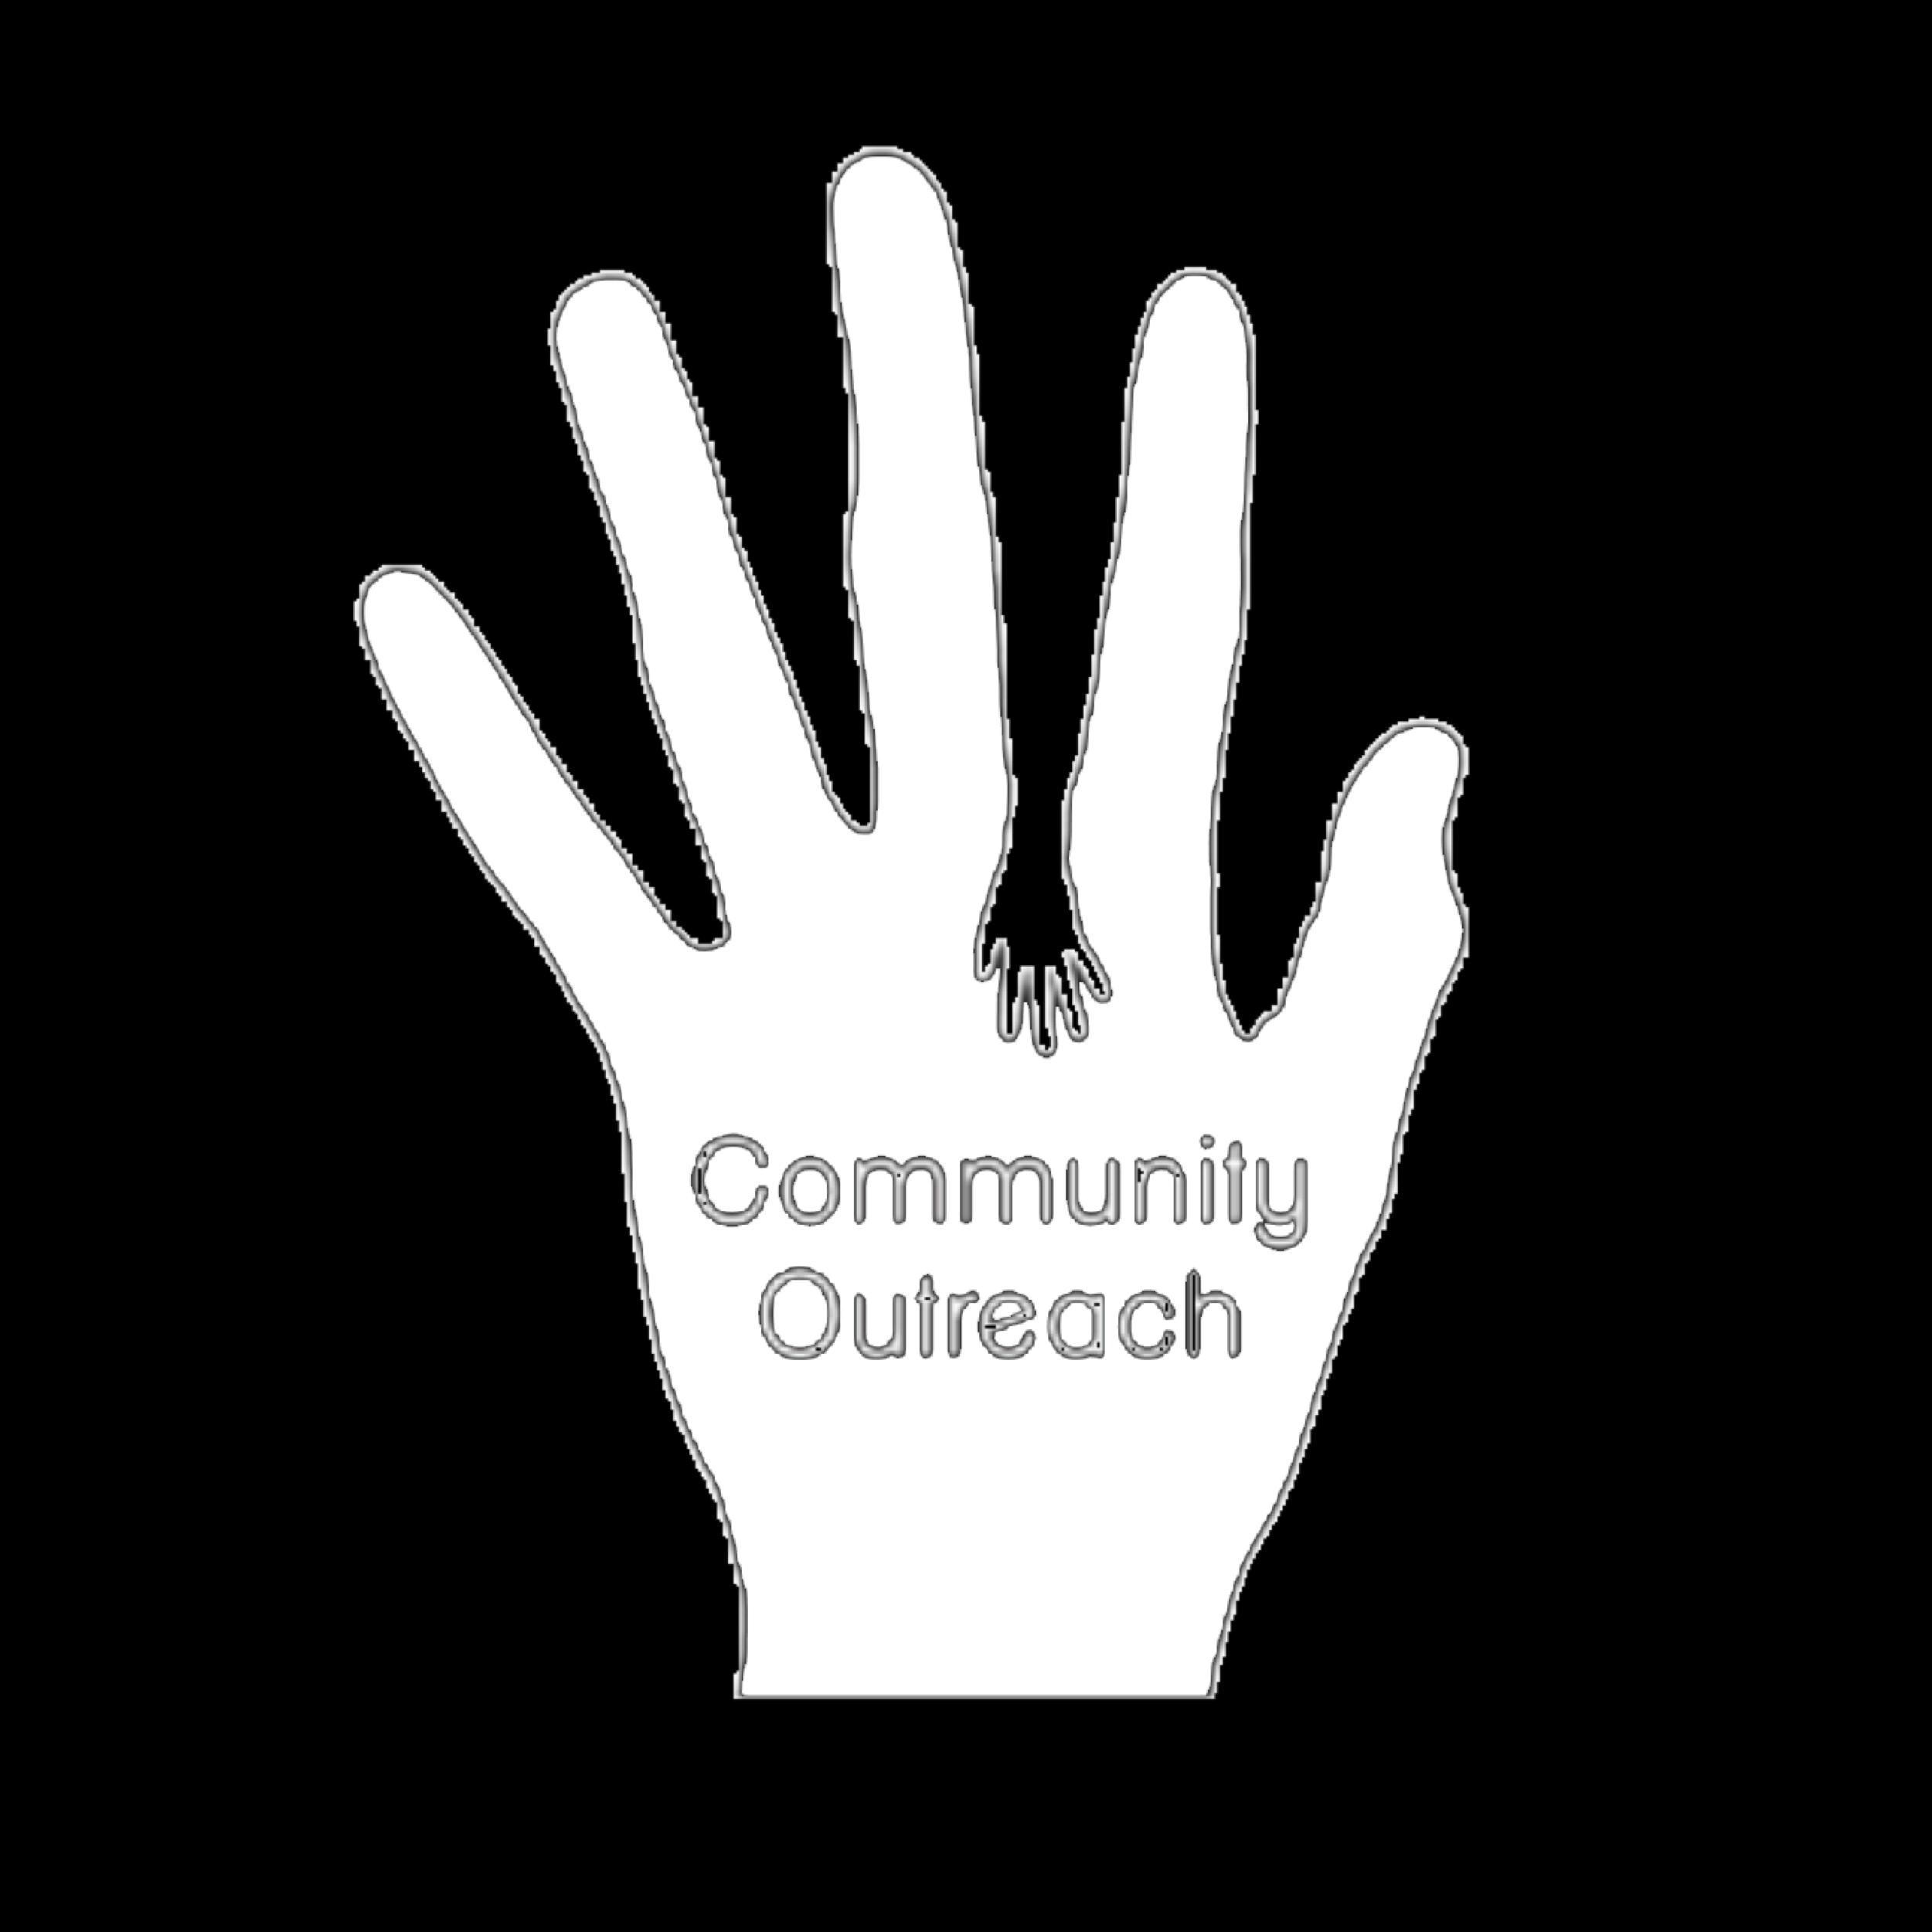 Copy of CO circle logo.png